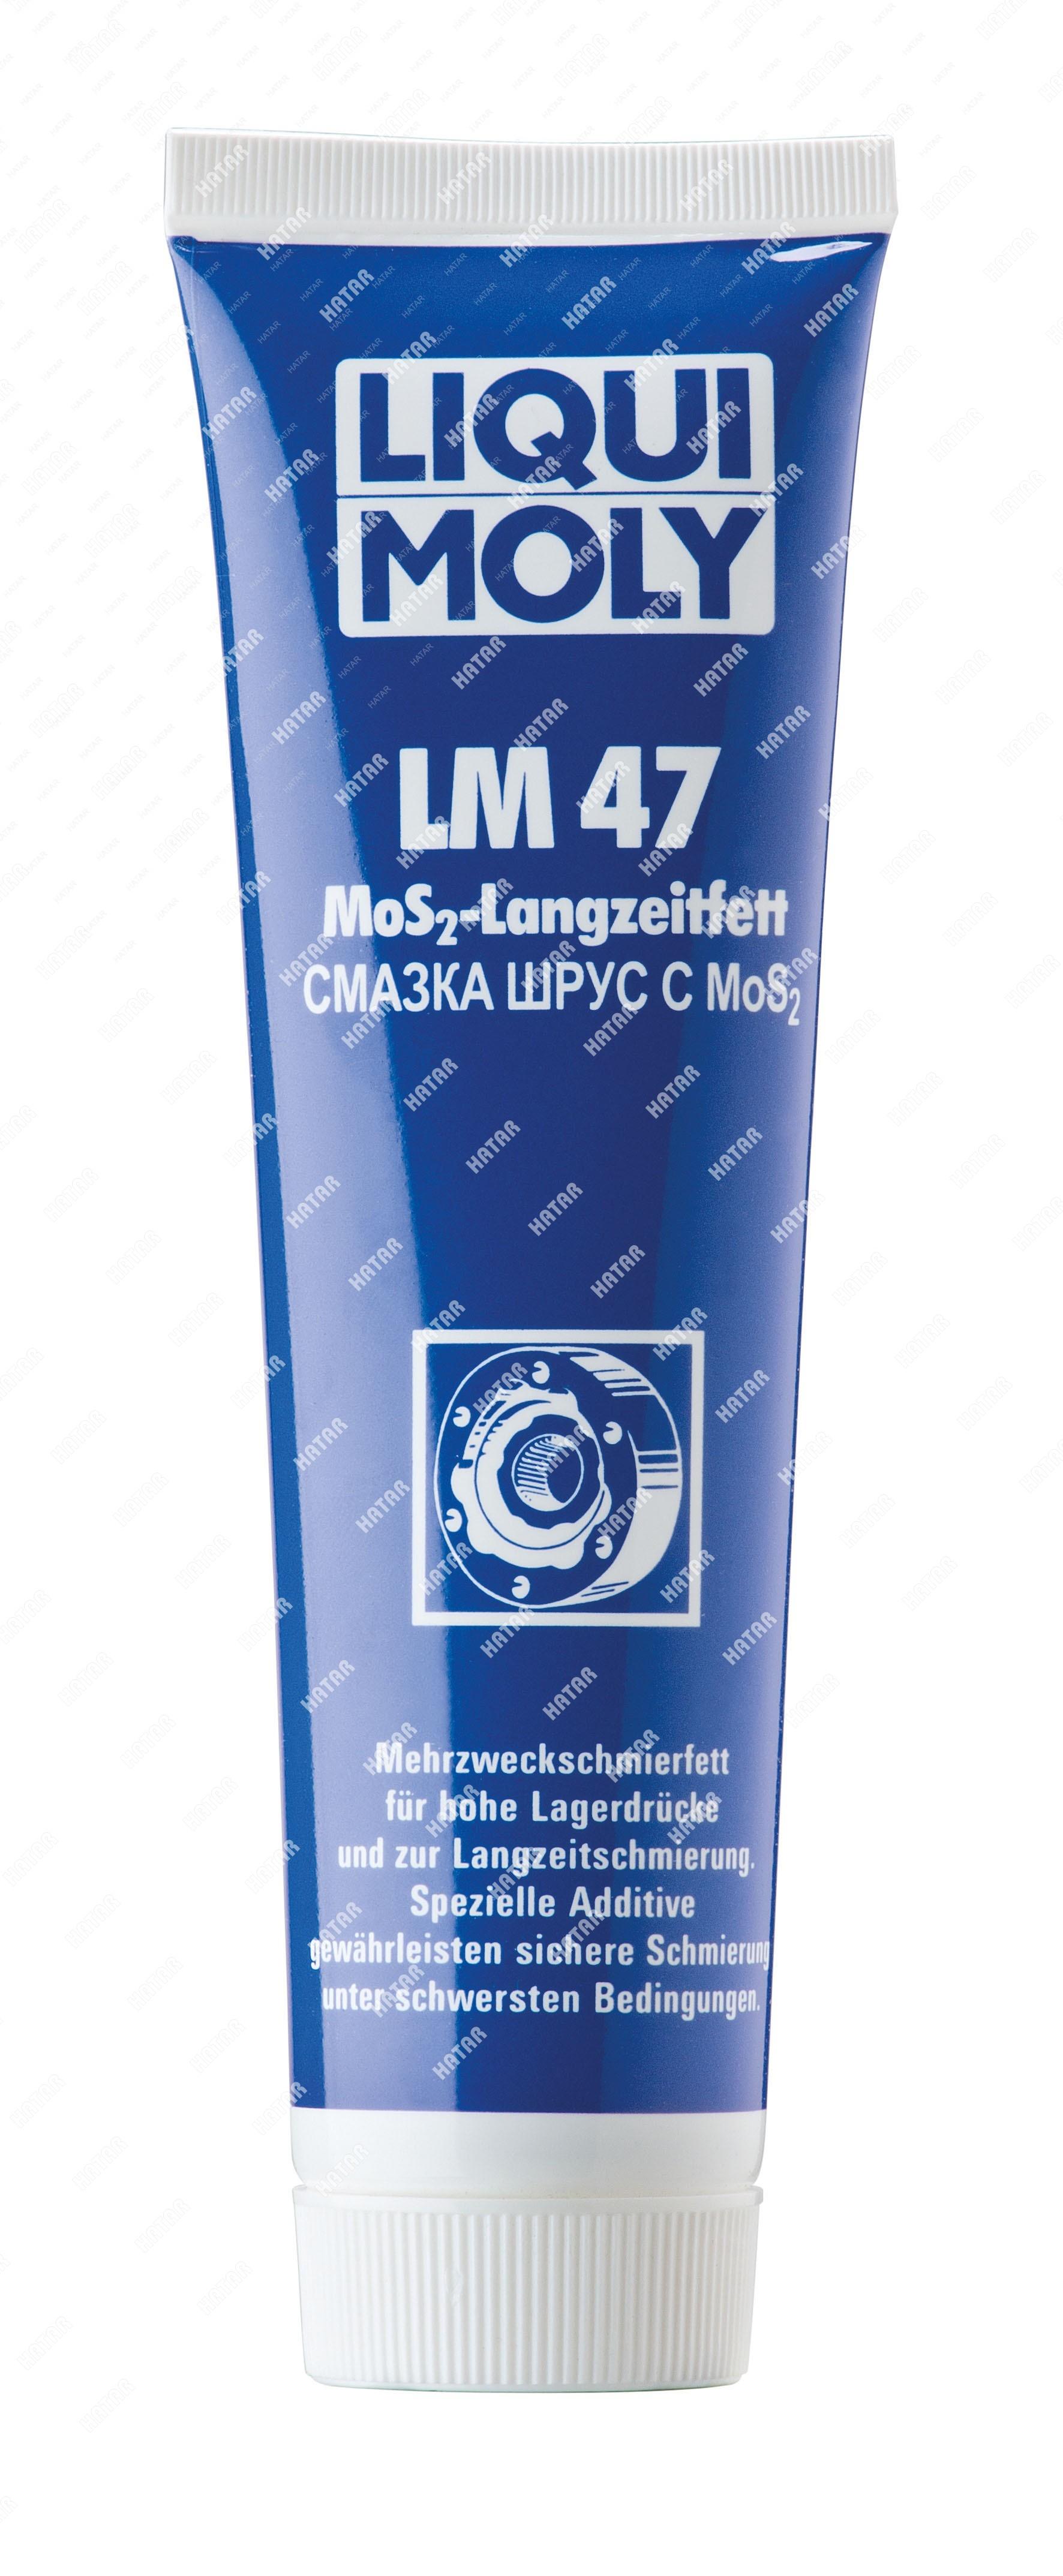 LIQUI MOLY Смазка шрус с дисульфидом молибденаlm 47 langzeitfett + mos2 (0,1кг)